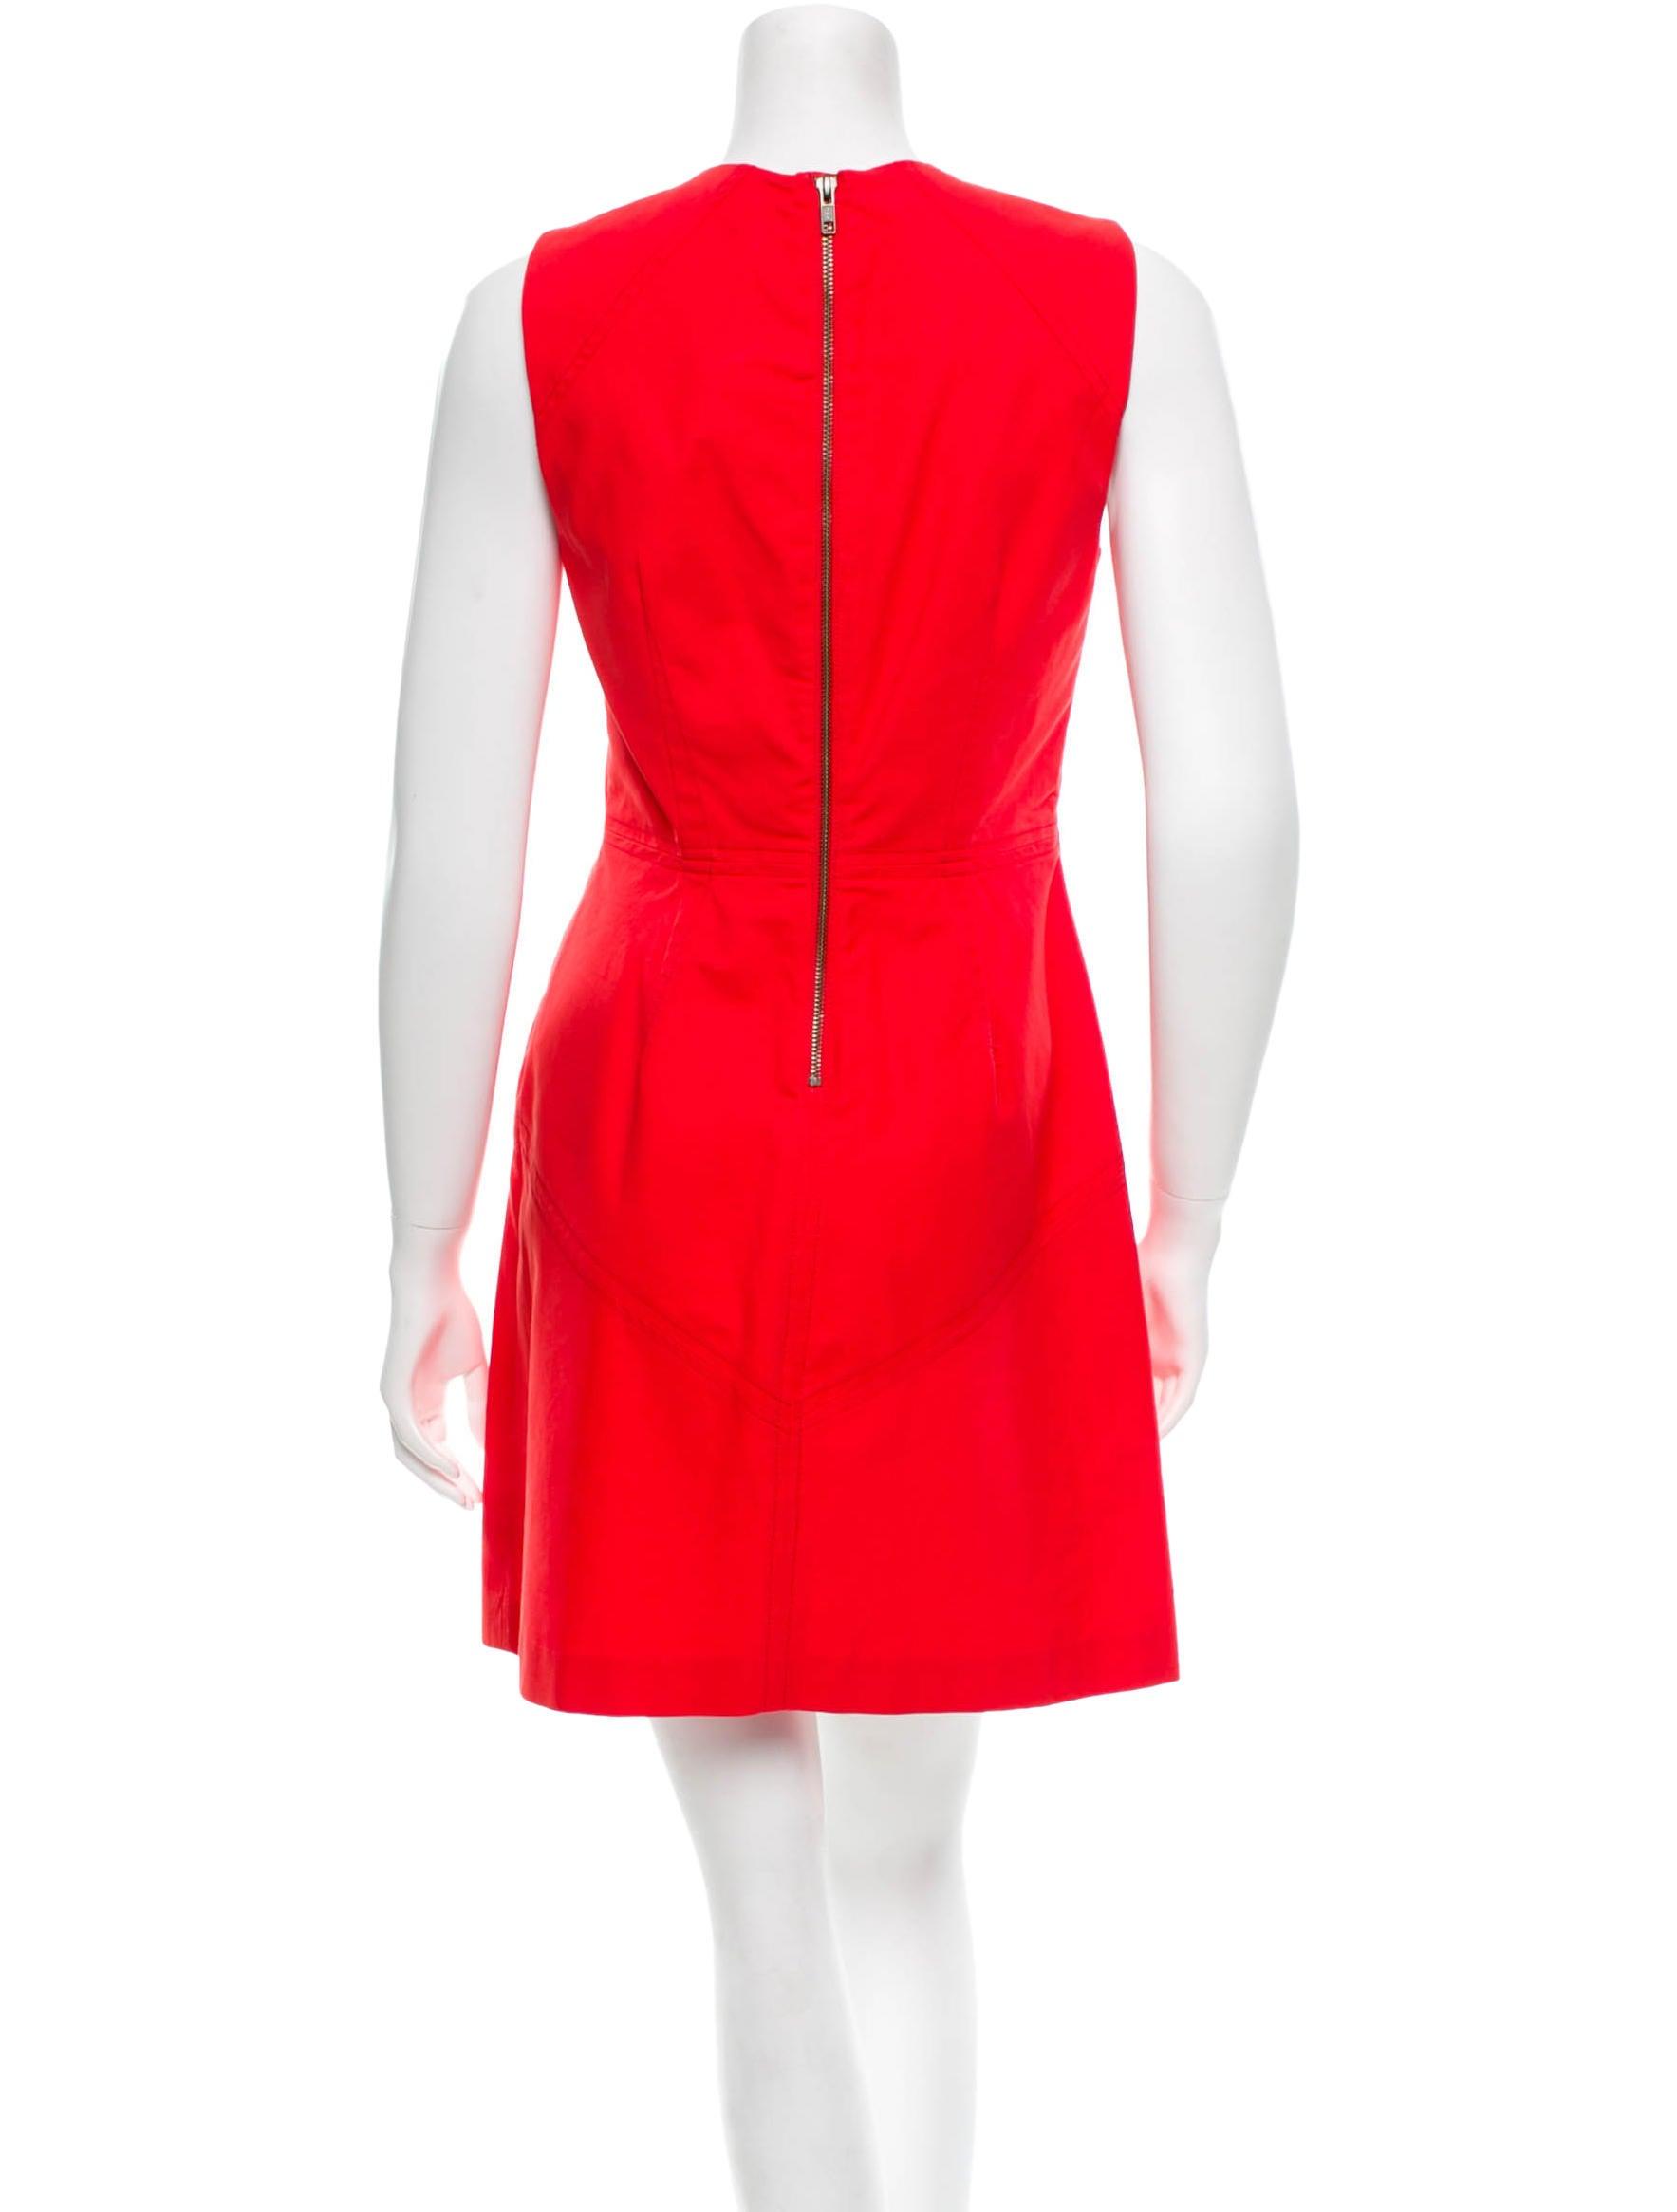 10 Crosby Derek Lam Dress Clothing Wdl21280 The Realreal